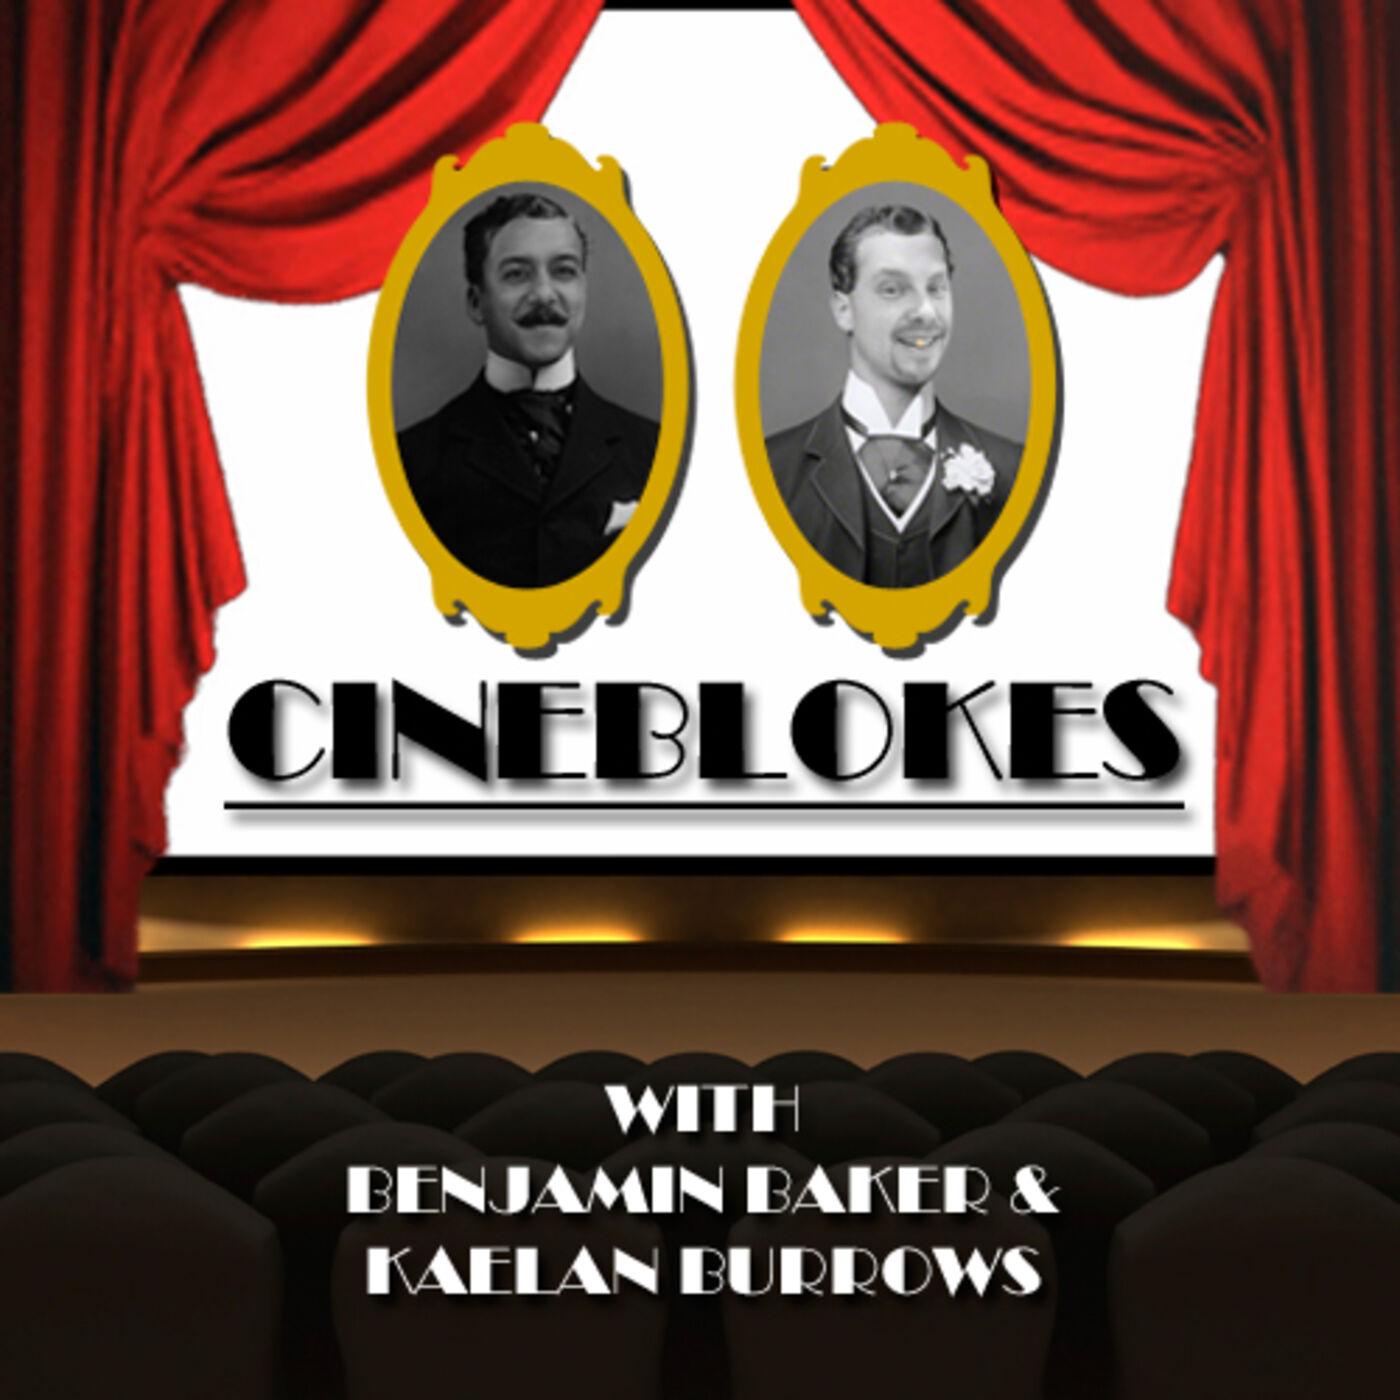 Cineblokes Episode 151 - Dune